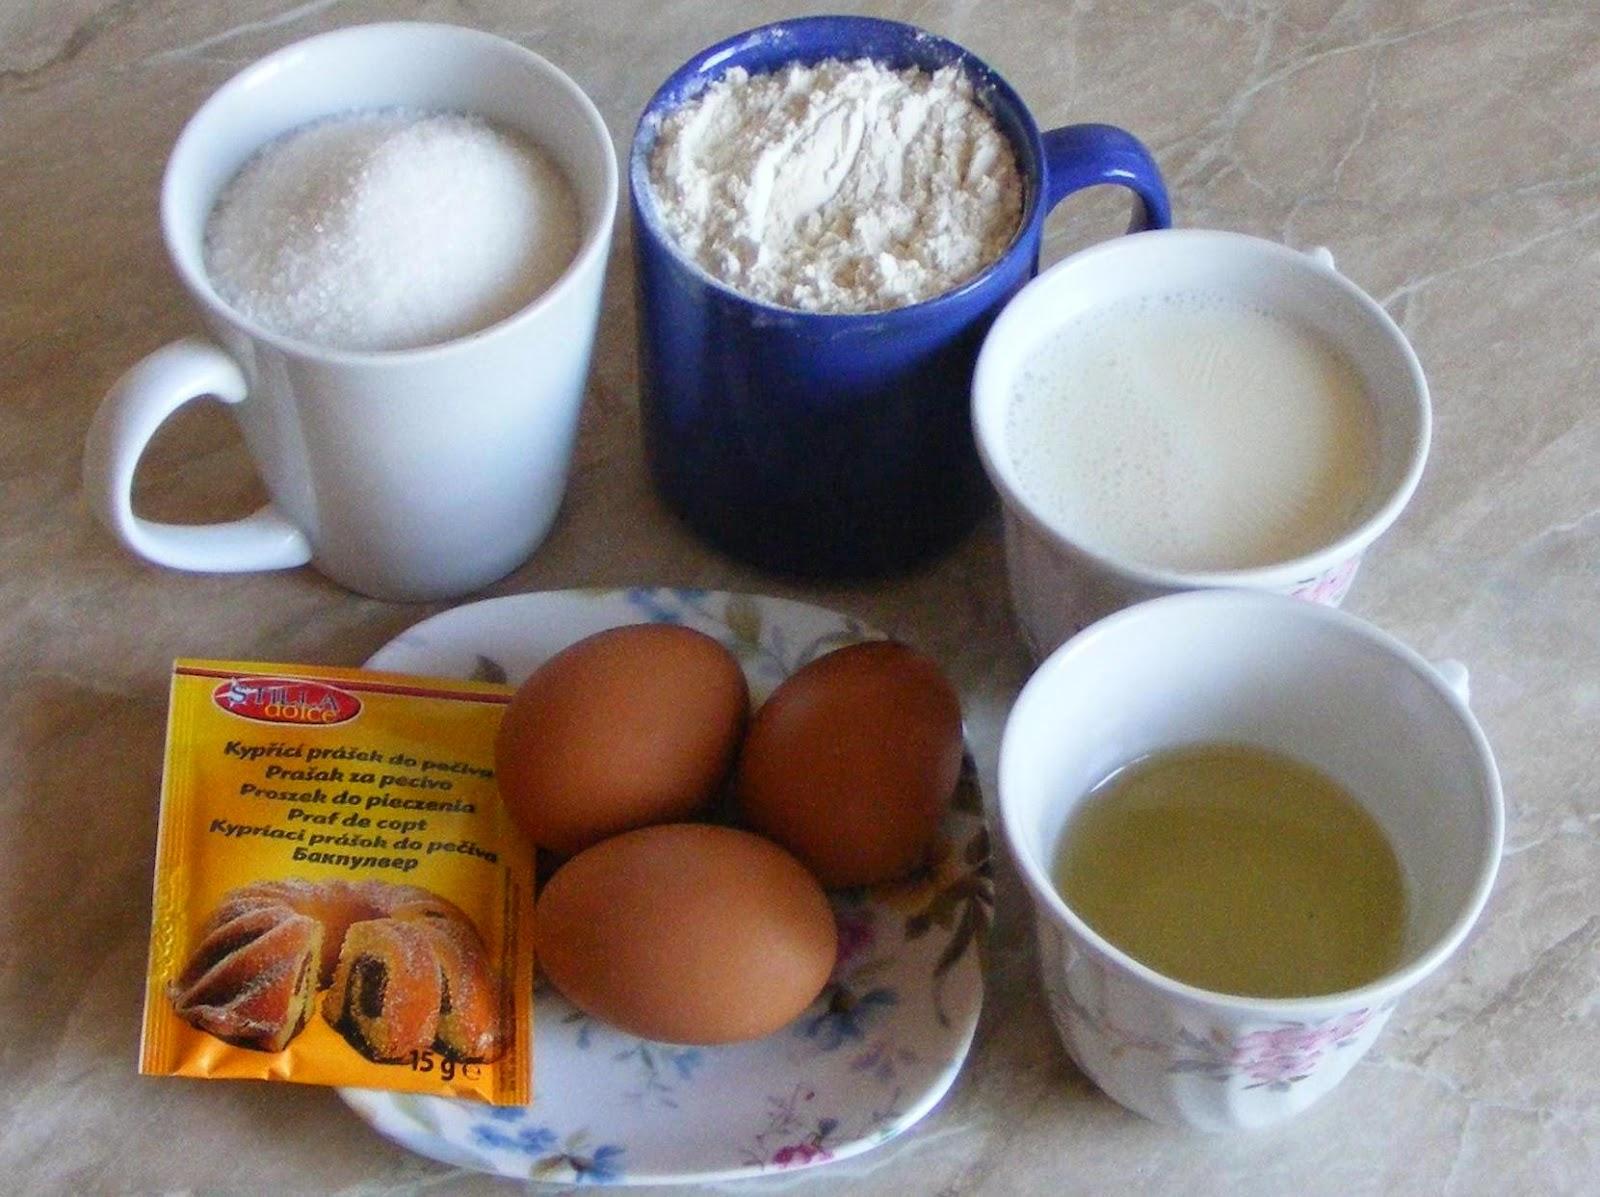 ingrediente prajitura cu visine din visinata, ingrediente prajitura cu visine, cum se prepara prajitura cu visine, cum facem prajitura de visine, de ce ingrediente avem nevoie pentru a face prajitura cu visine din visinata,